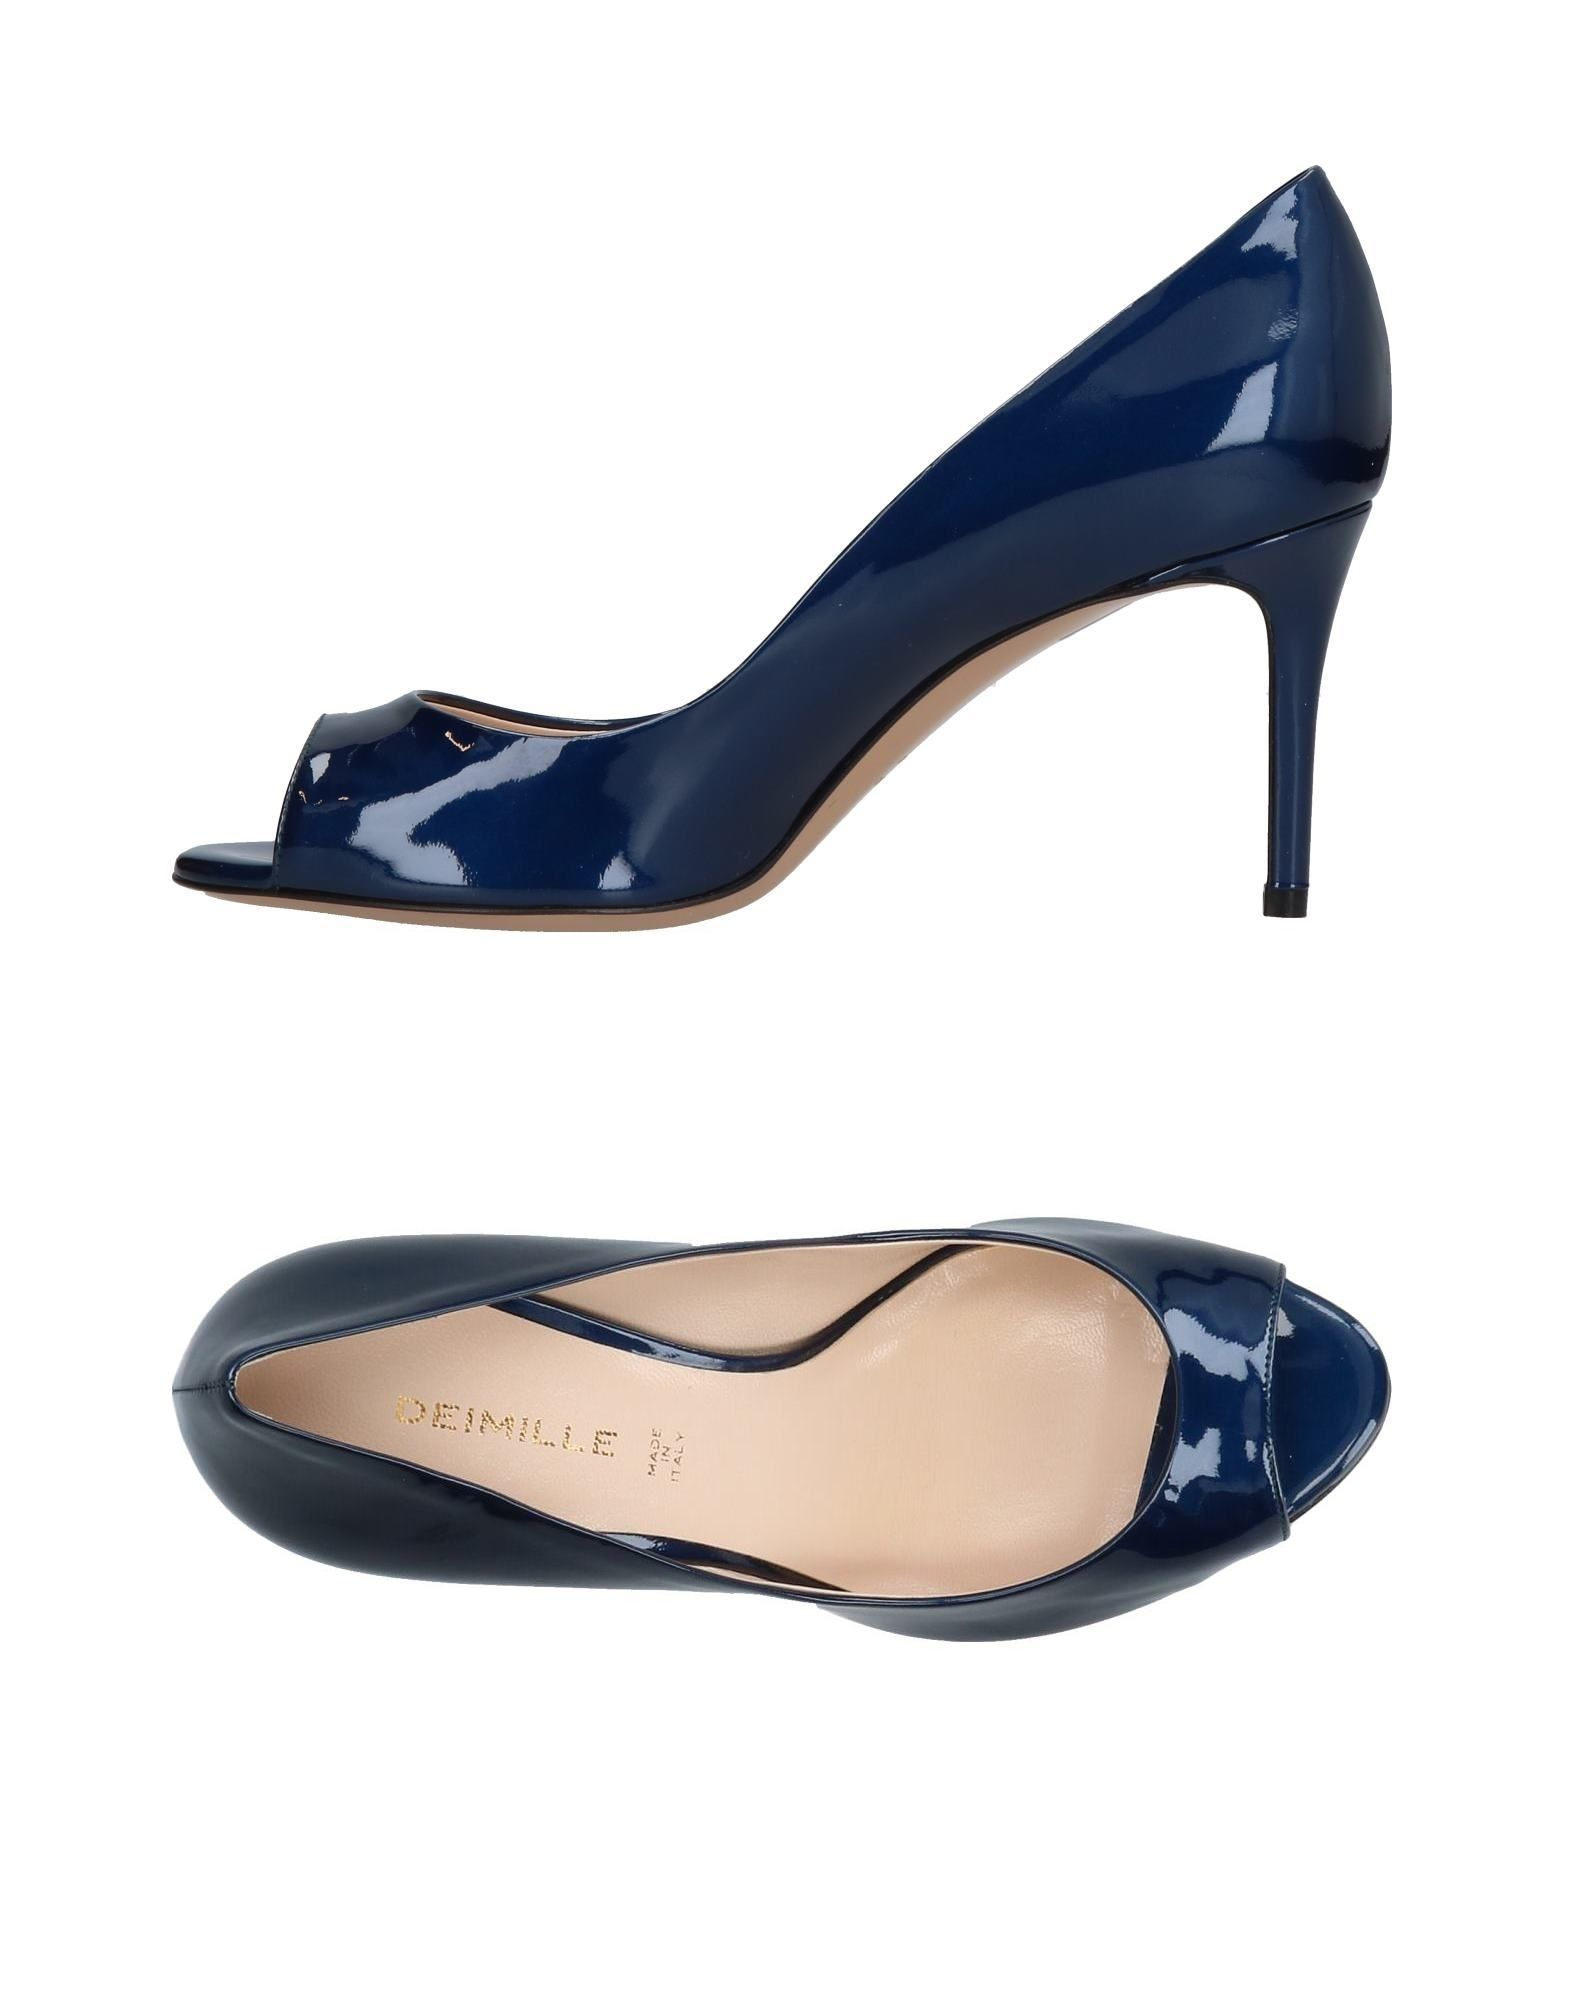 Deimille Pumps Damen  11339121SM Gute Qualität beliebte Schuhe